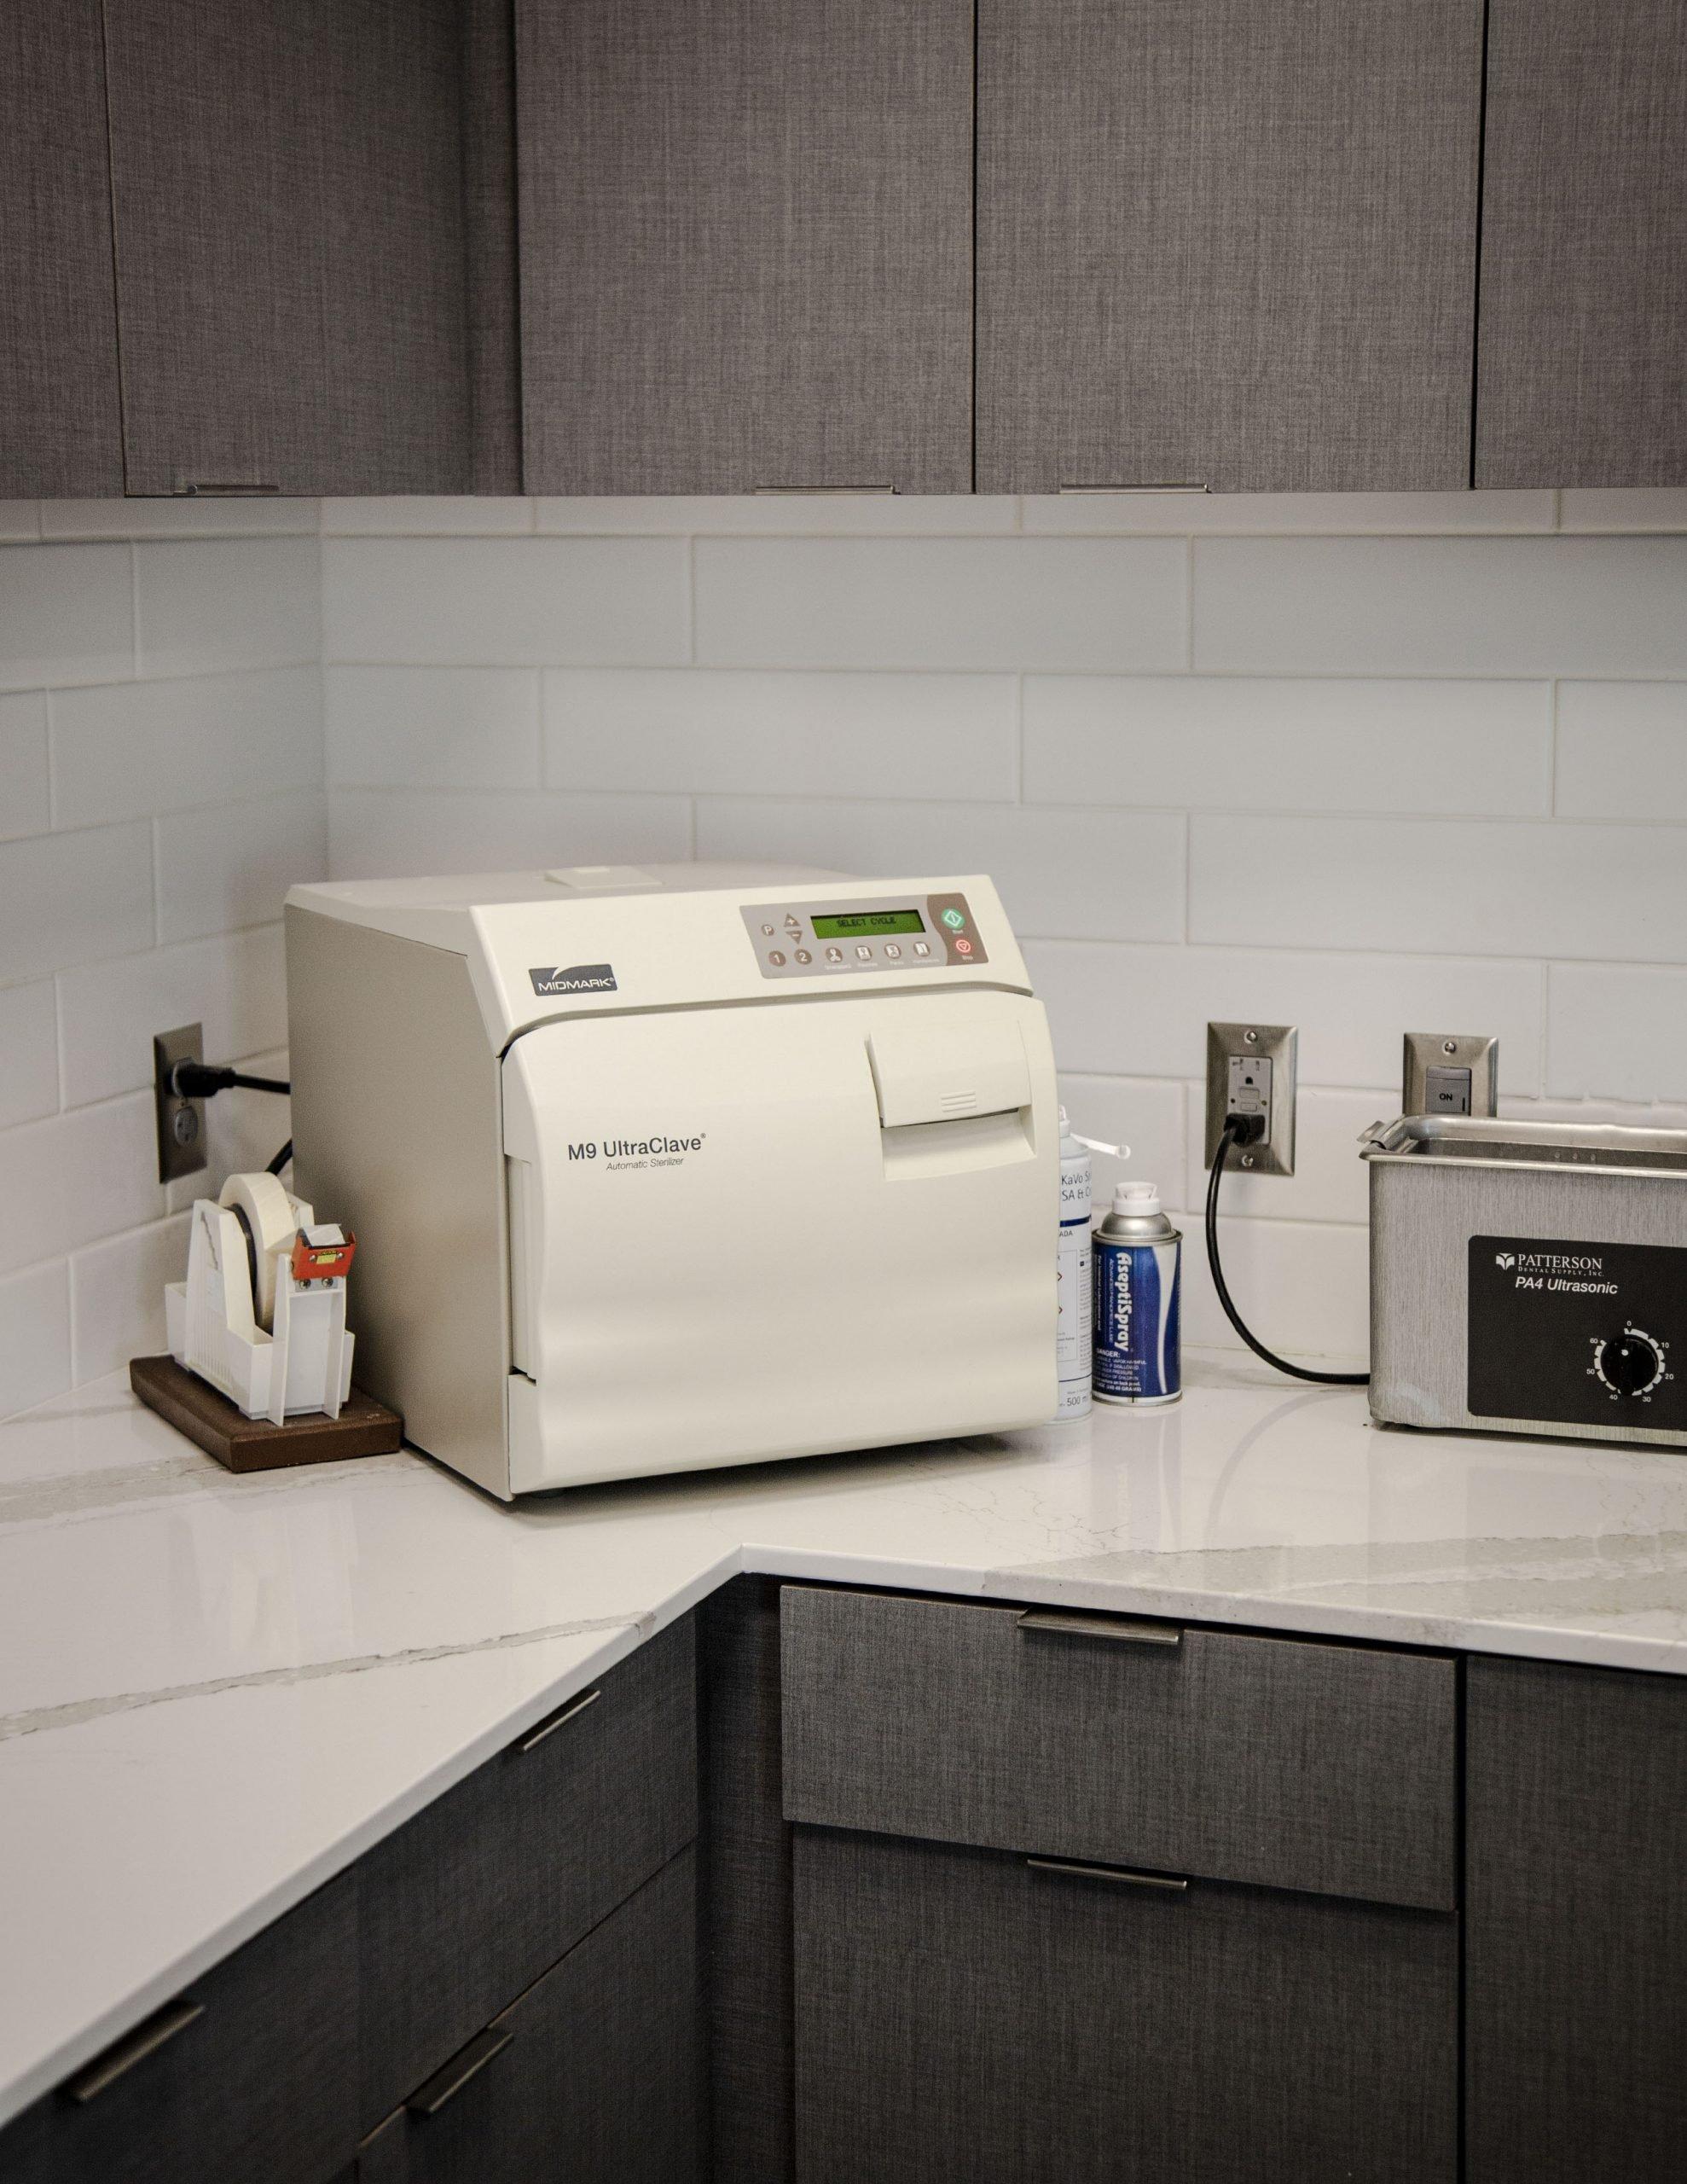 ultraclave machine